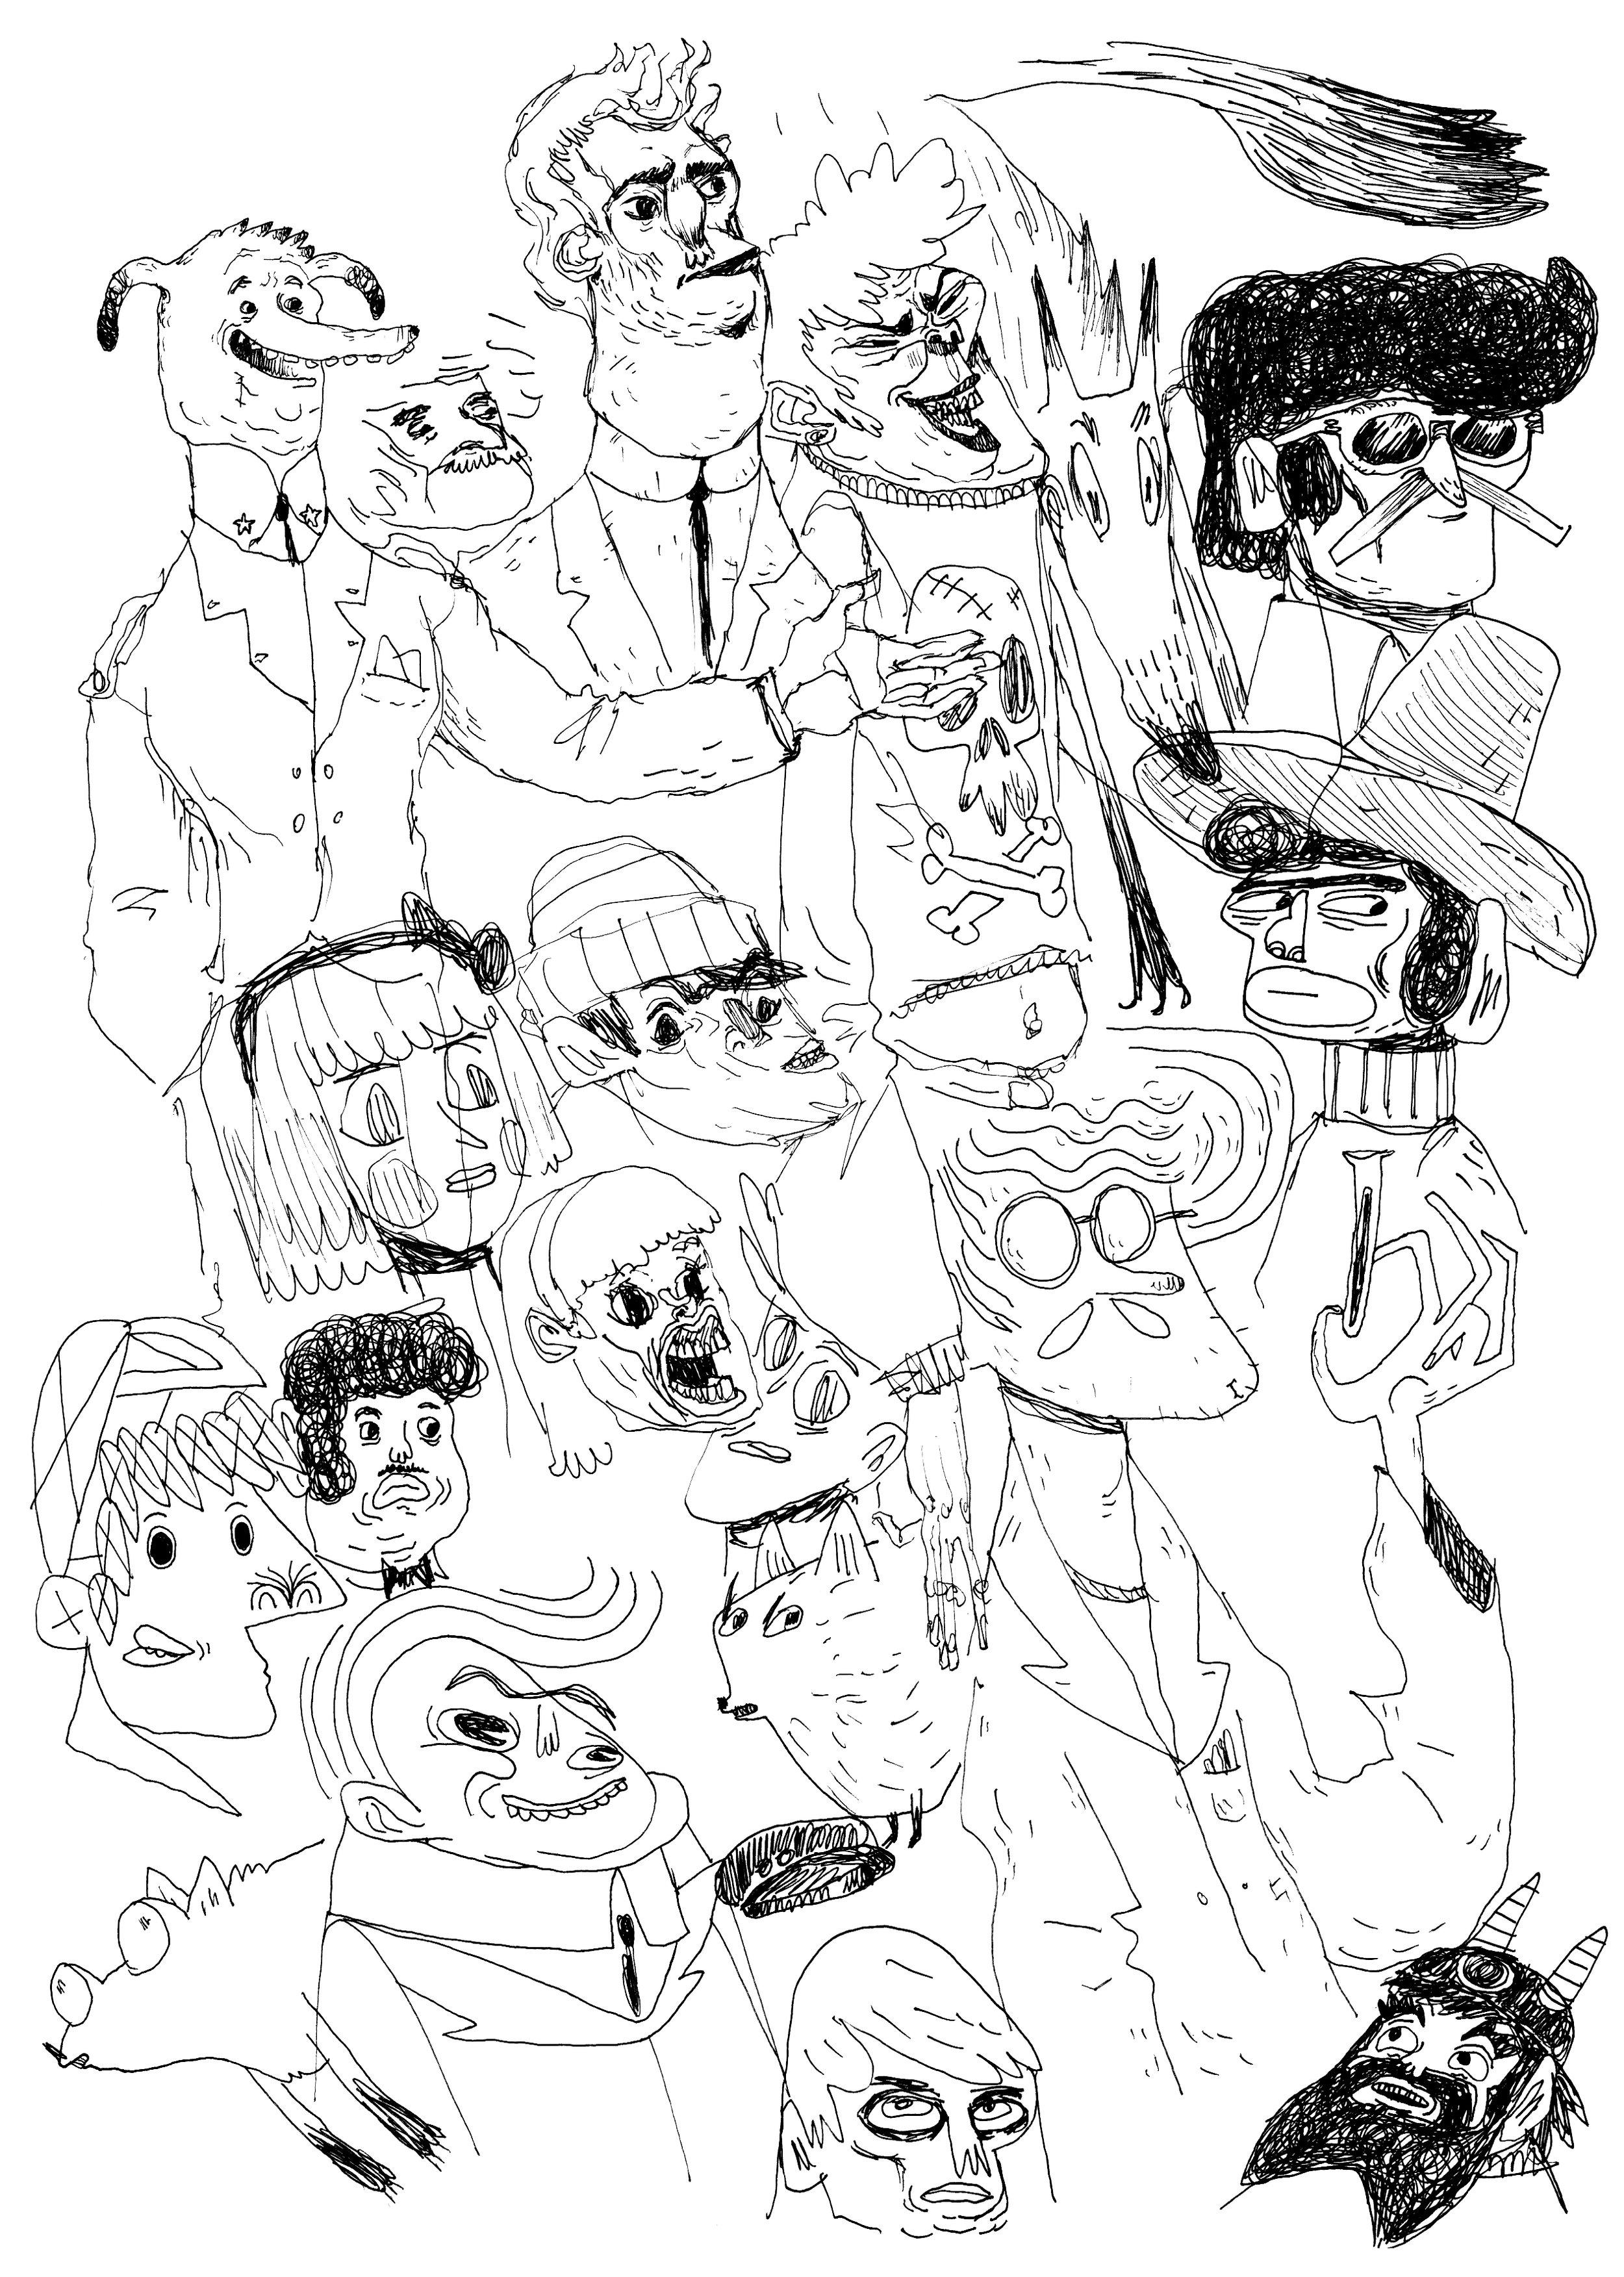 Pascal_Zaffiro_Doodle_26.jpg